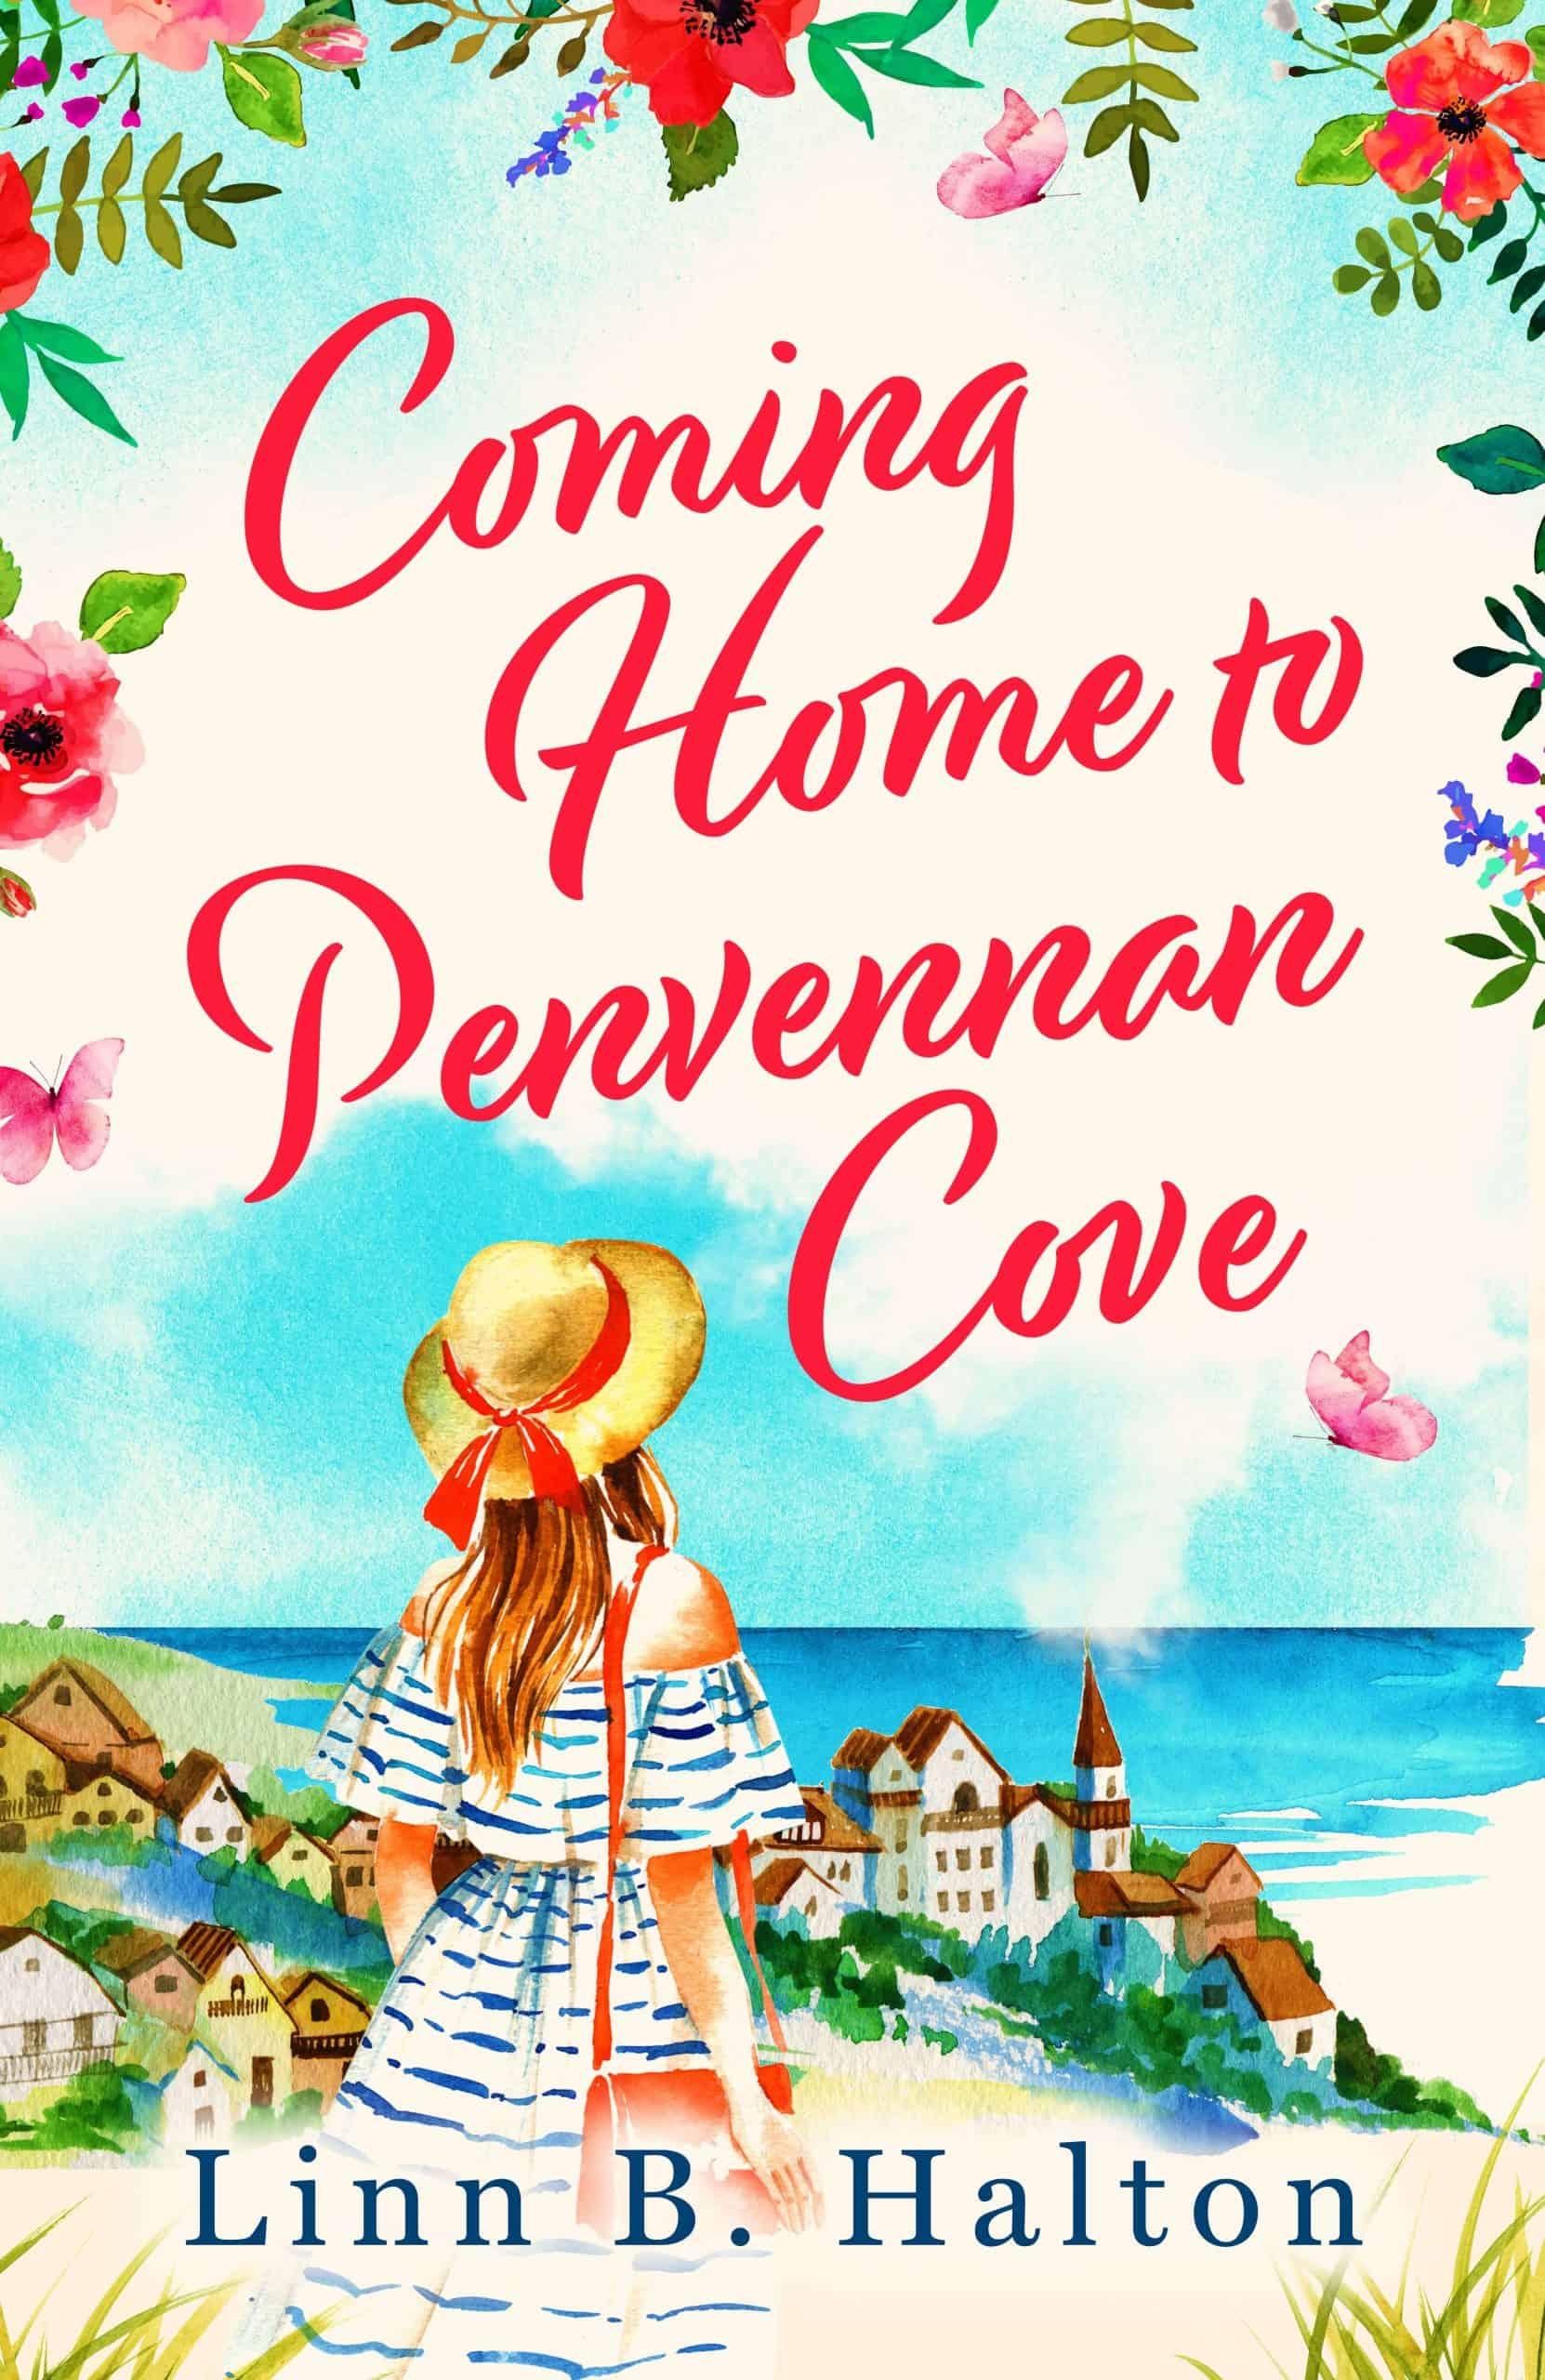 Coming Home to Penvennan Cove by Linn B Halton - Book Review